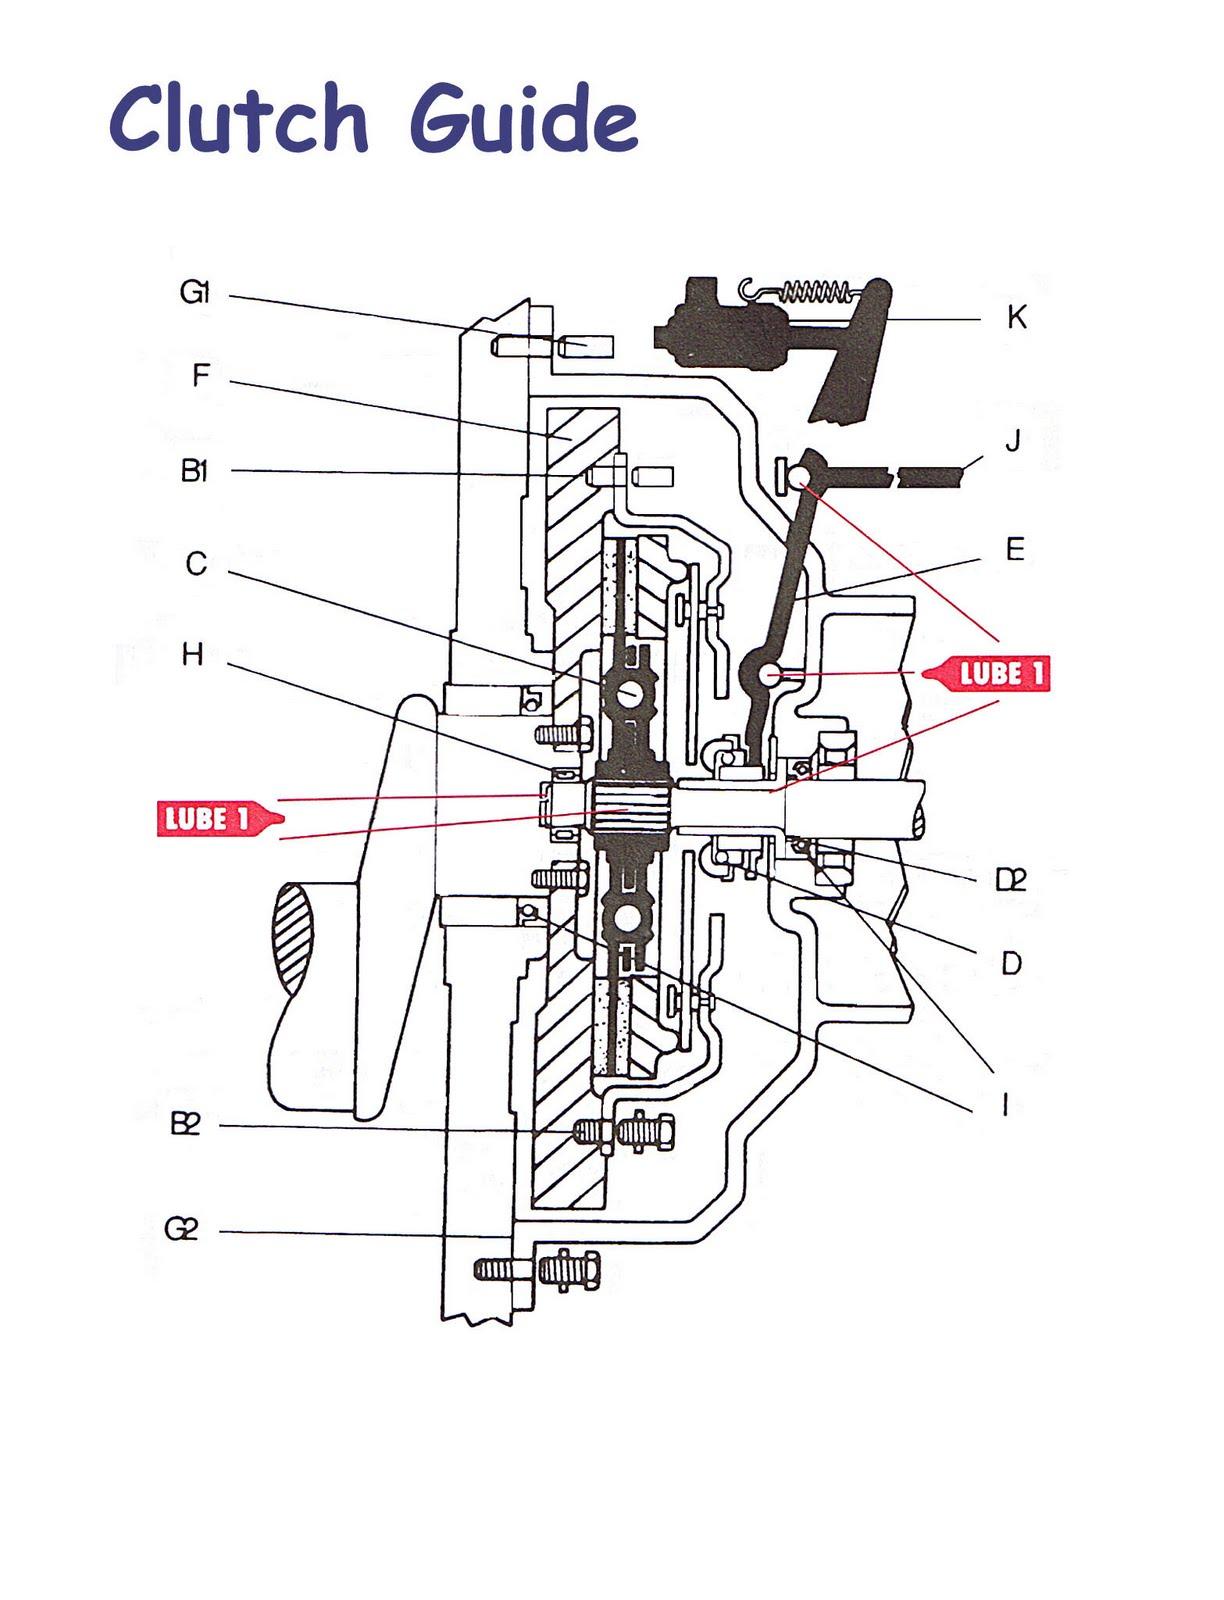 1996 club car wiring diagram 36 volt direct tv swm mid 90s ds runs without key on – readingrat.net